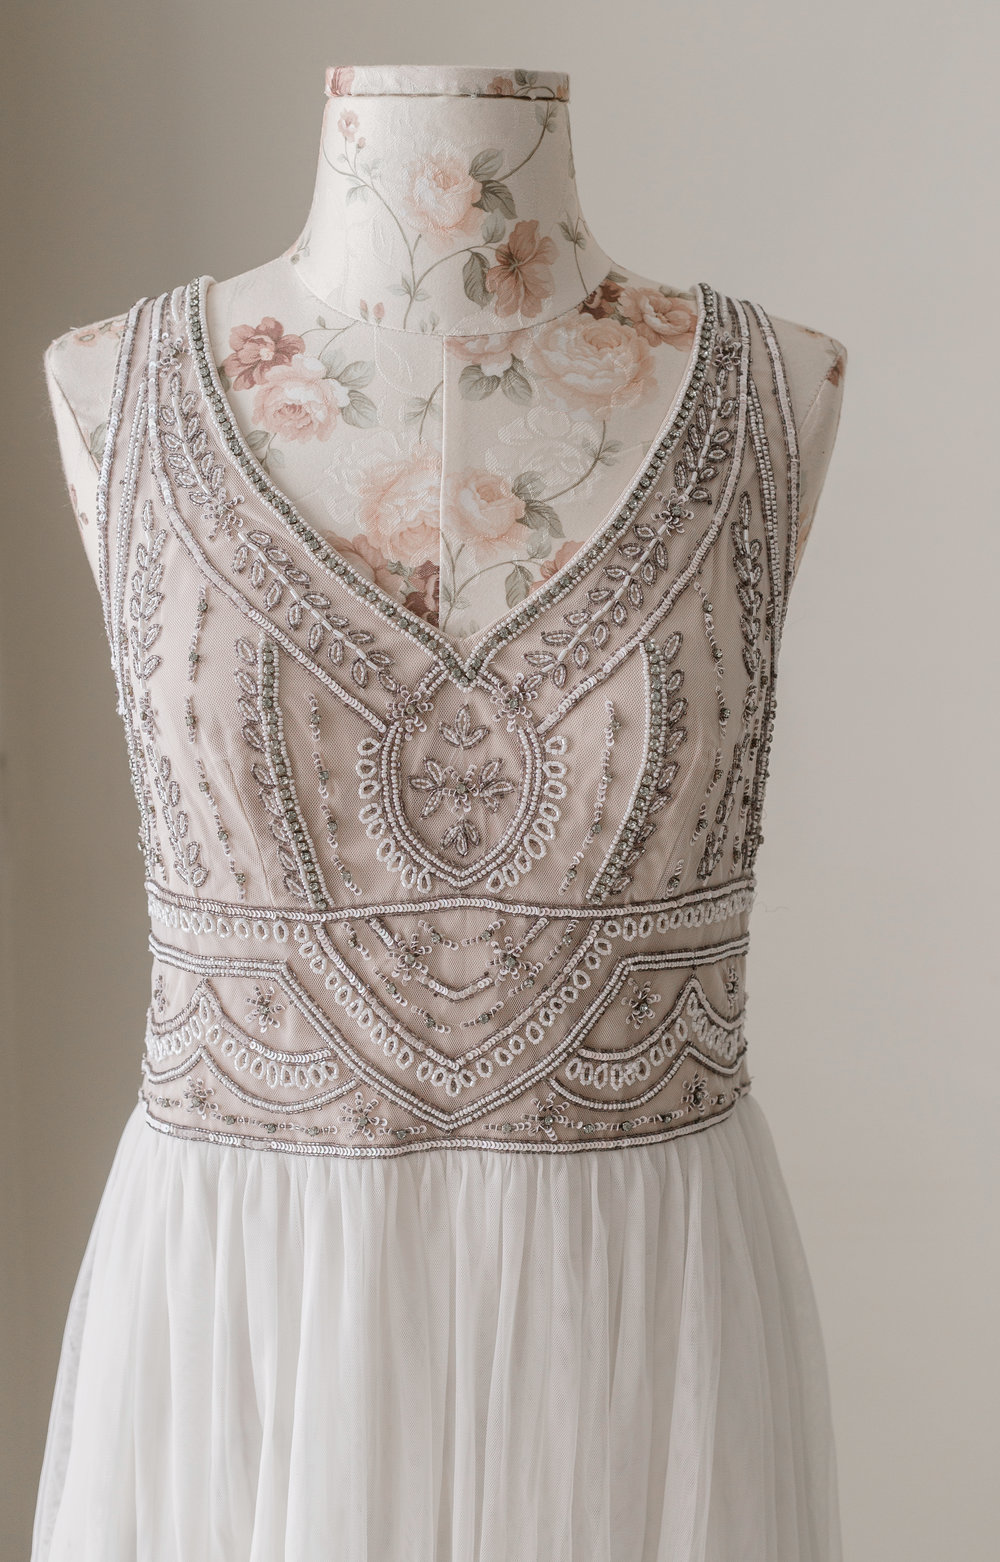 Studio Gown 15 (Details)